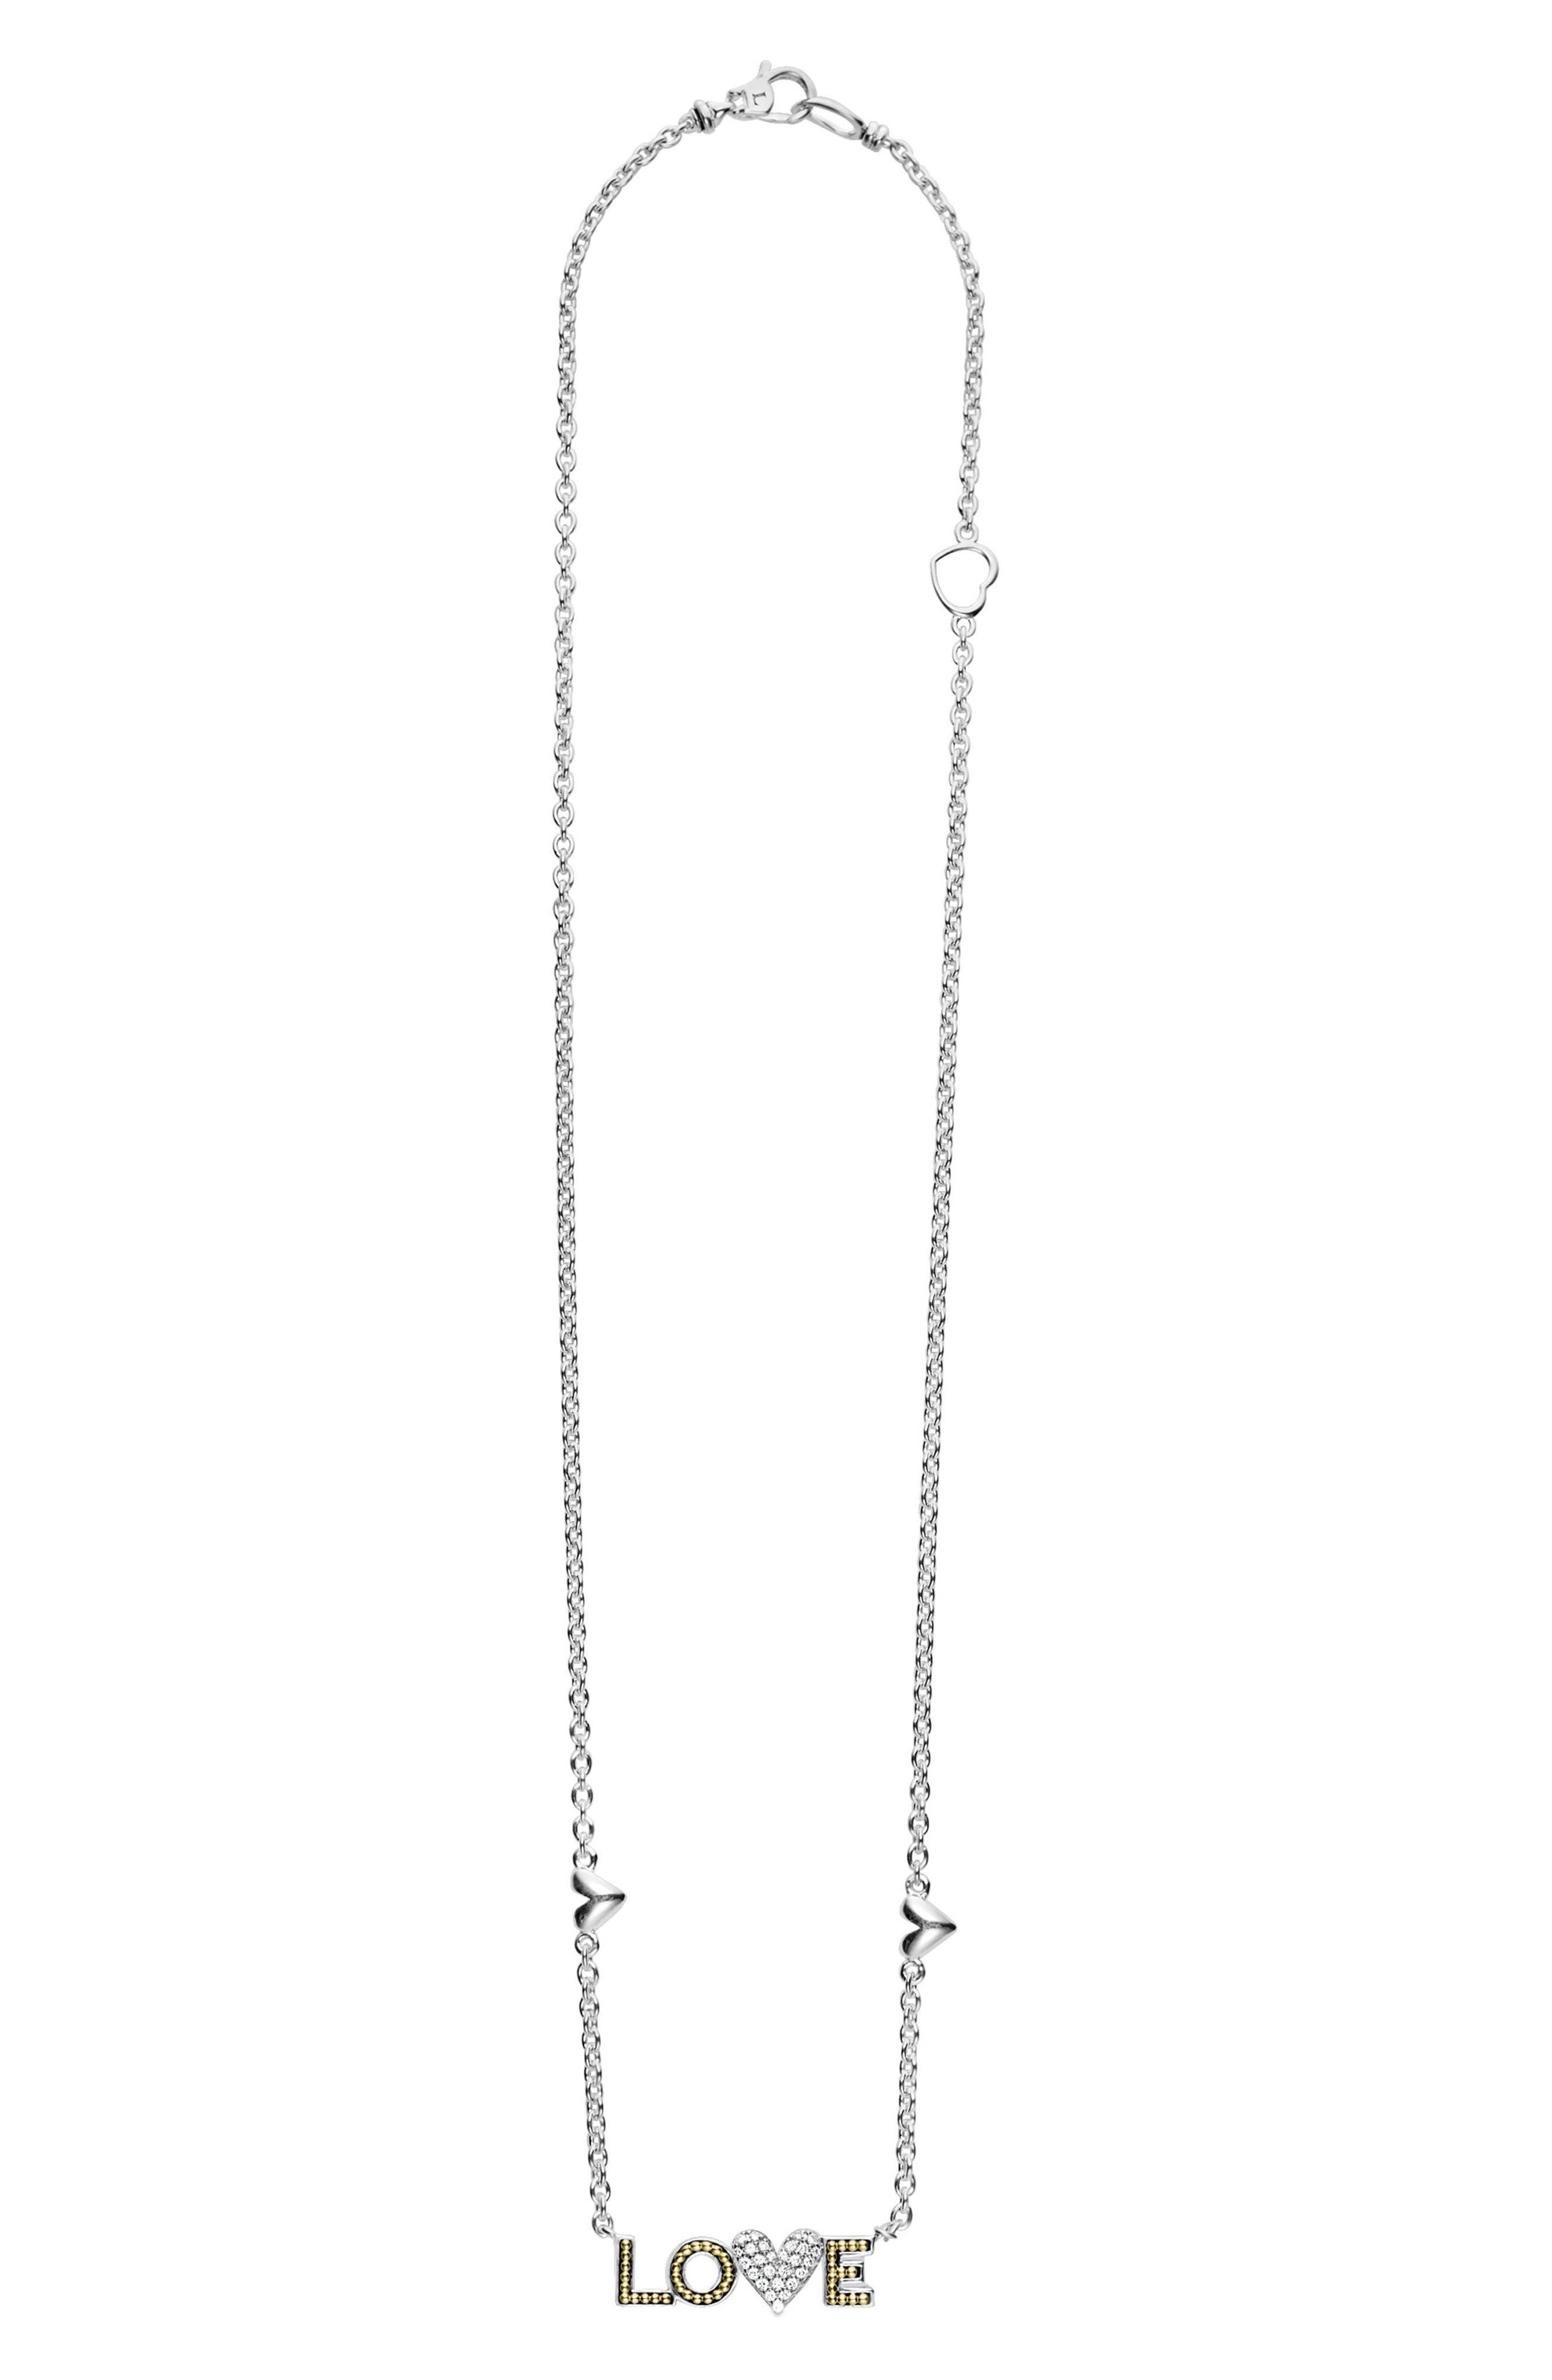 Beloved Diamond Love Pendant Necklace,                         Main,                         color, Silver/ Diamond